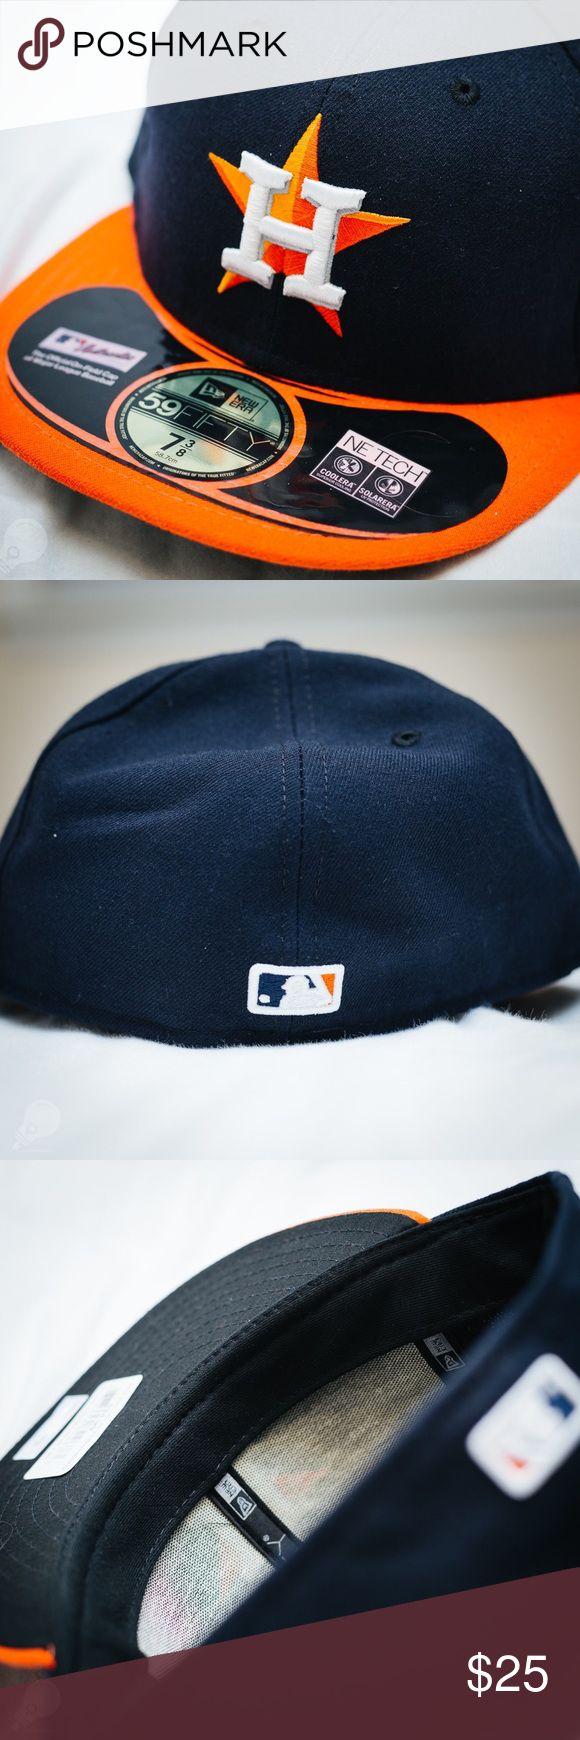 Spotted while shopping on Poshmark: New Era 59FIFTY Houston Astros Official Hat! #poshmark #fashion #shopping #style #New Era #Other